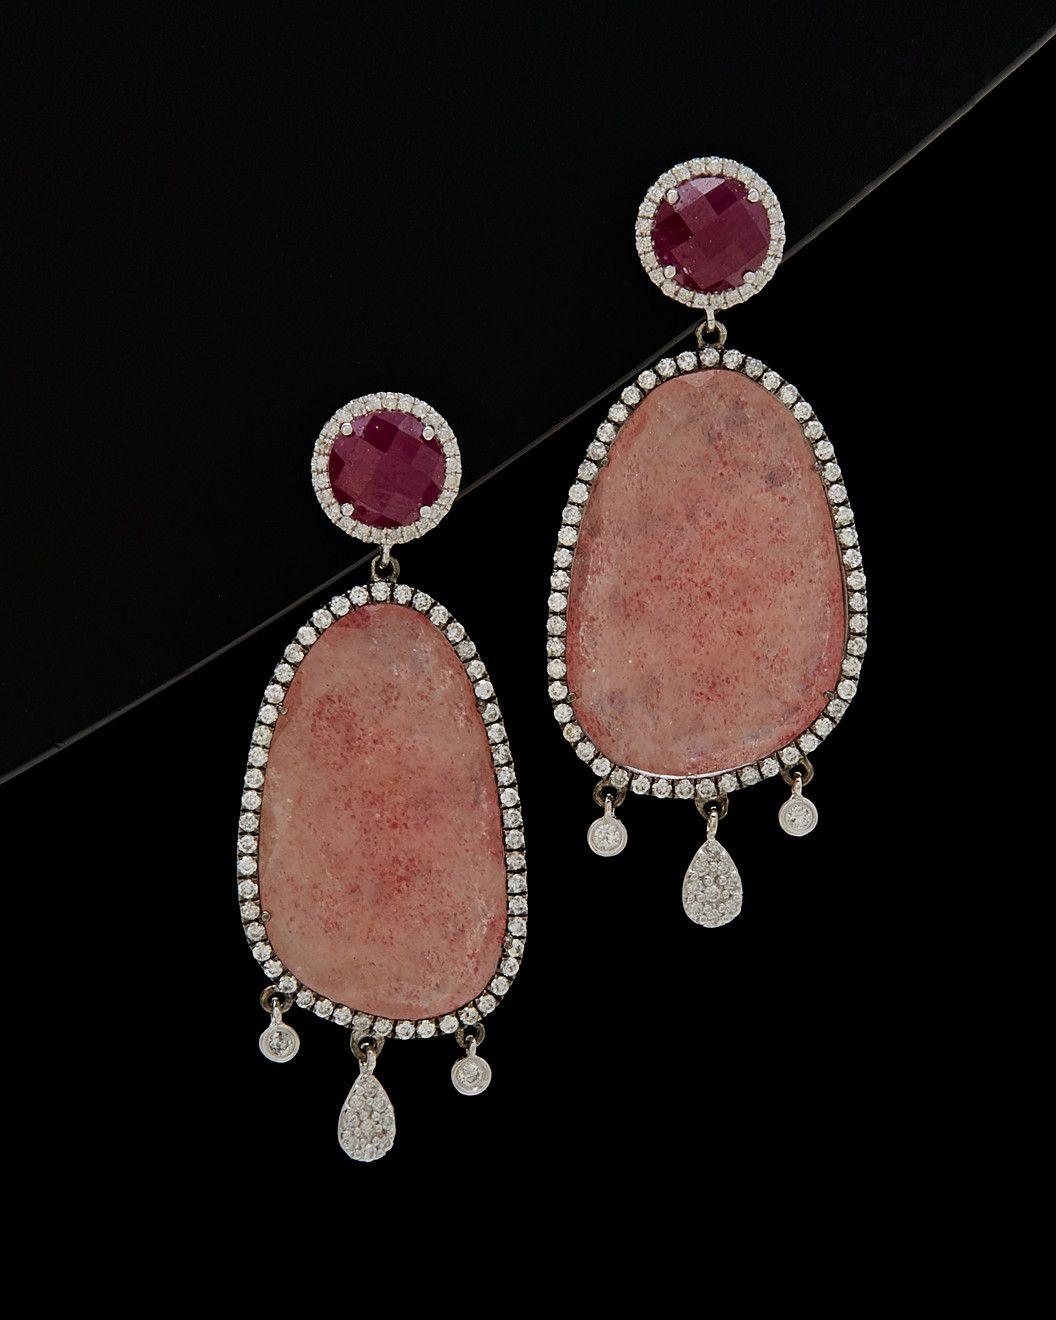 Ruby and Quartz earrings